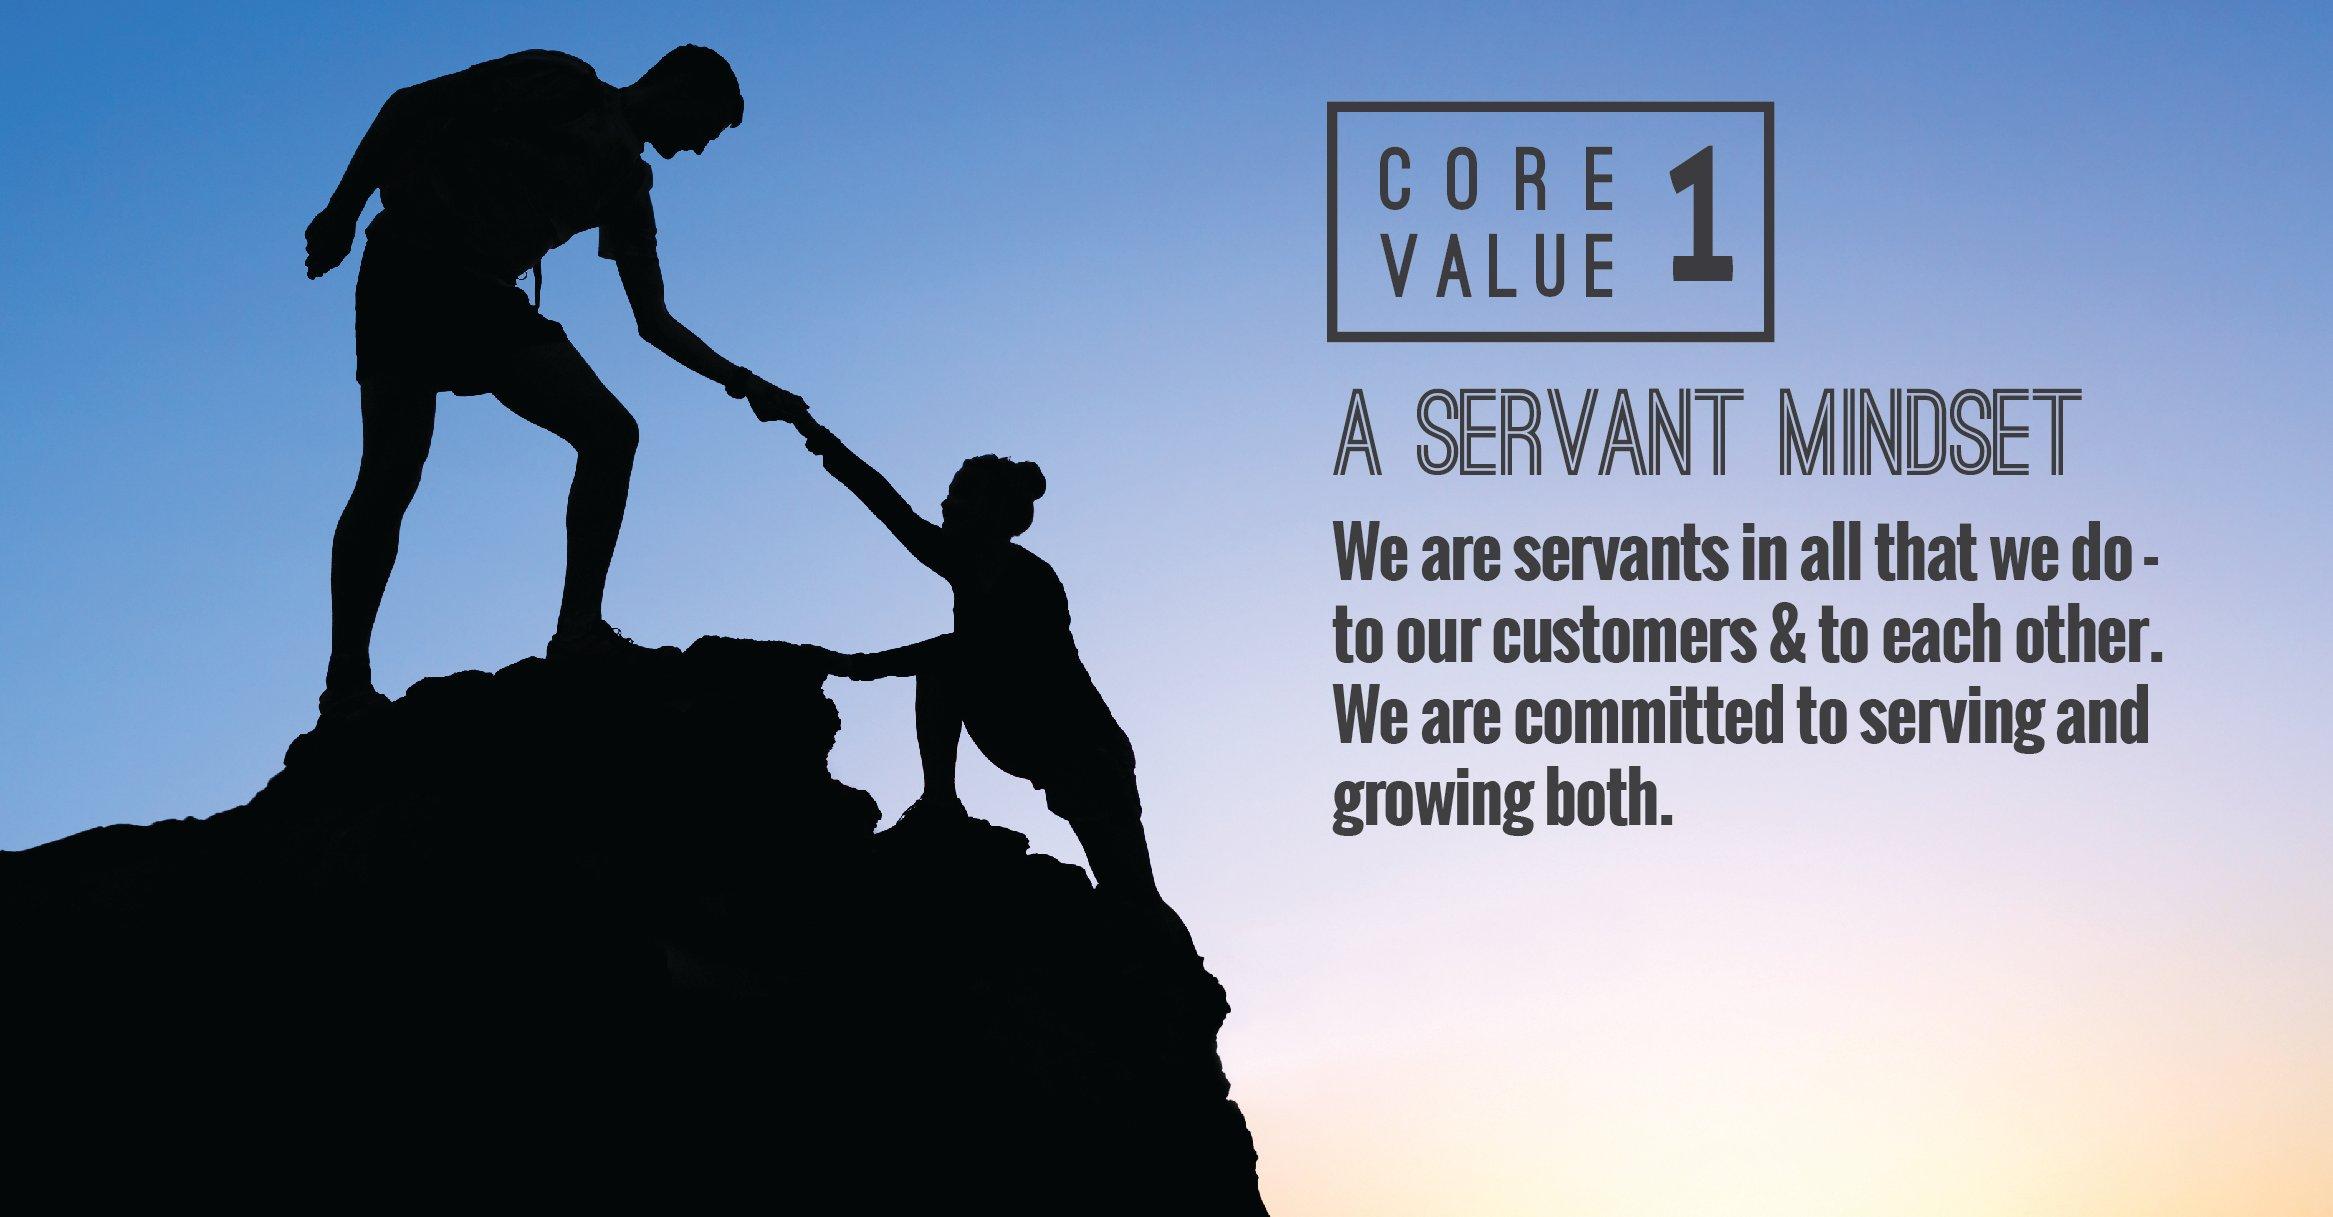 Core_Value_1_-_A_Servant_Mindset-01.jpg